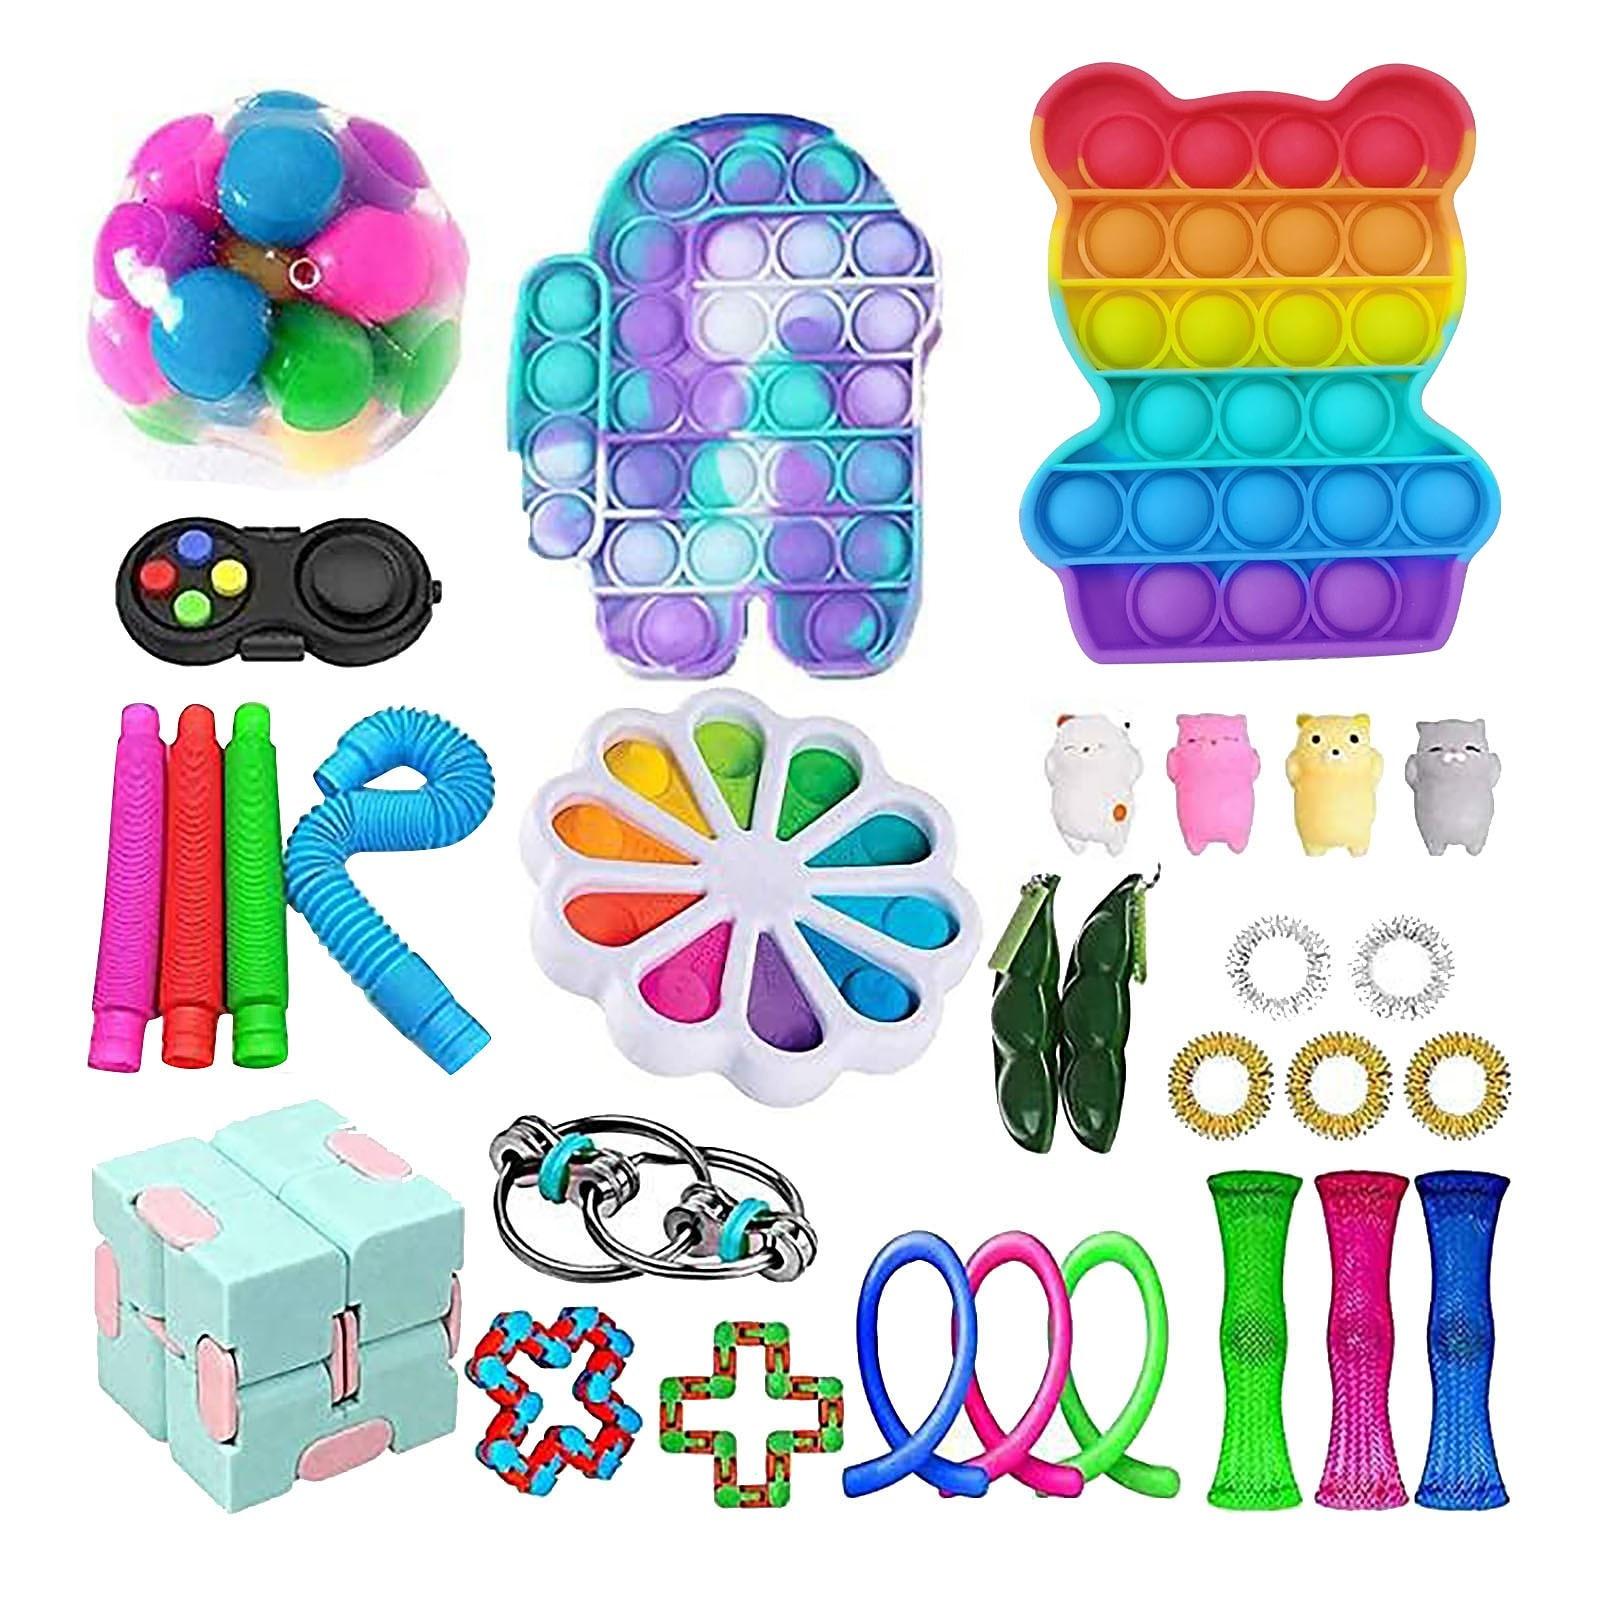 37PC Cheap Fidget Toys Anti Stress Set Strings Relief Pack Gift for Adults Children Figet Sensory - Simple Dimple Fidget